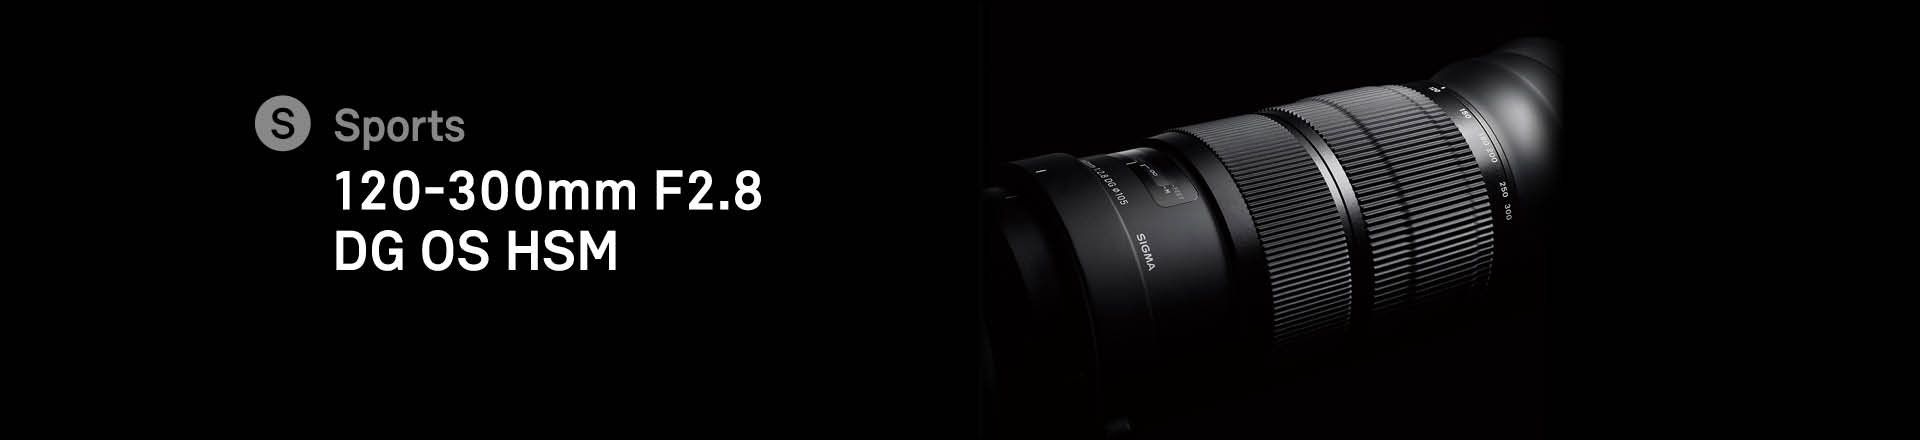 120-300mm F2,8 DG OS HSM